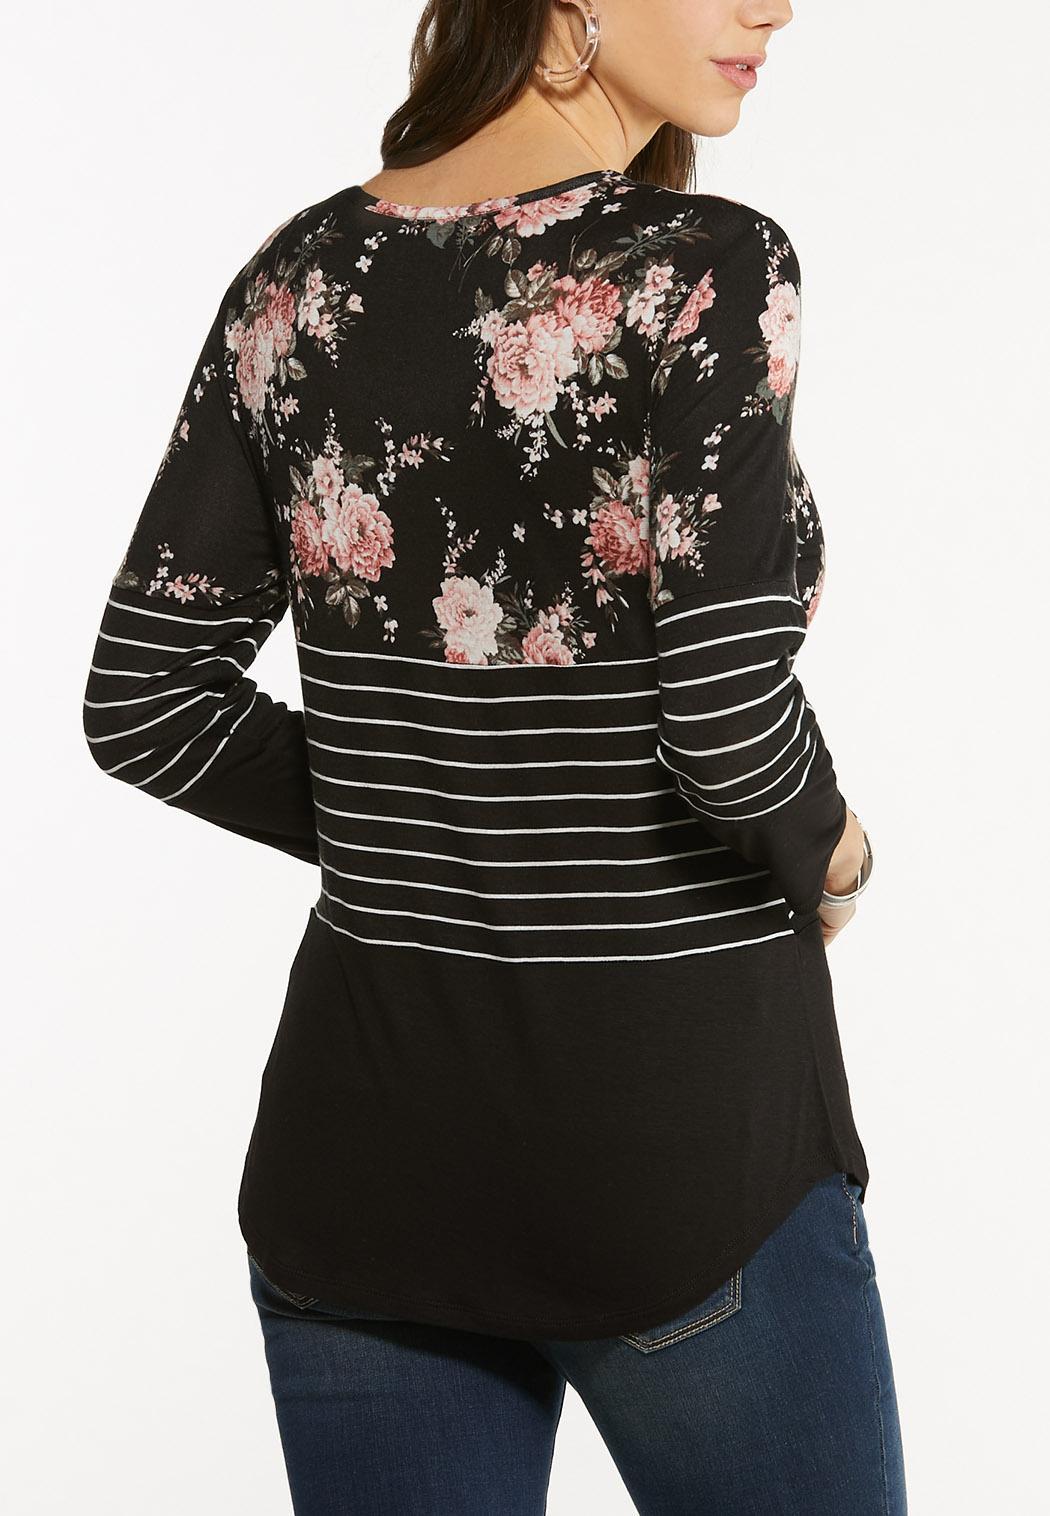 Plus Size Criss Cross Striped Floral Top (Item #44518215)